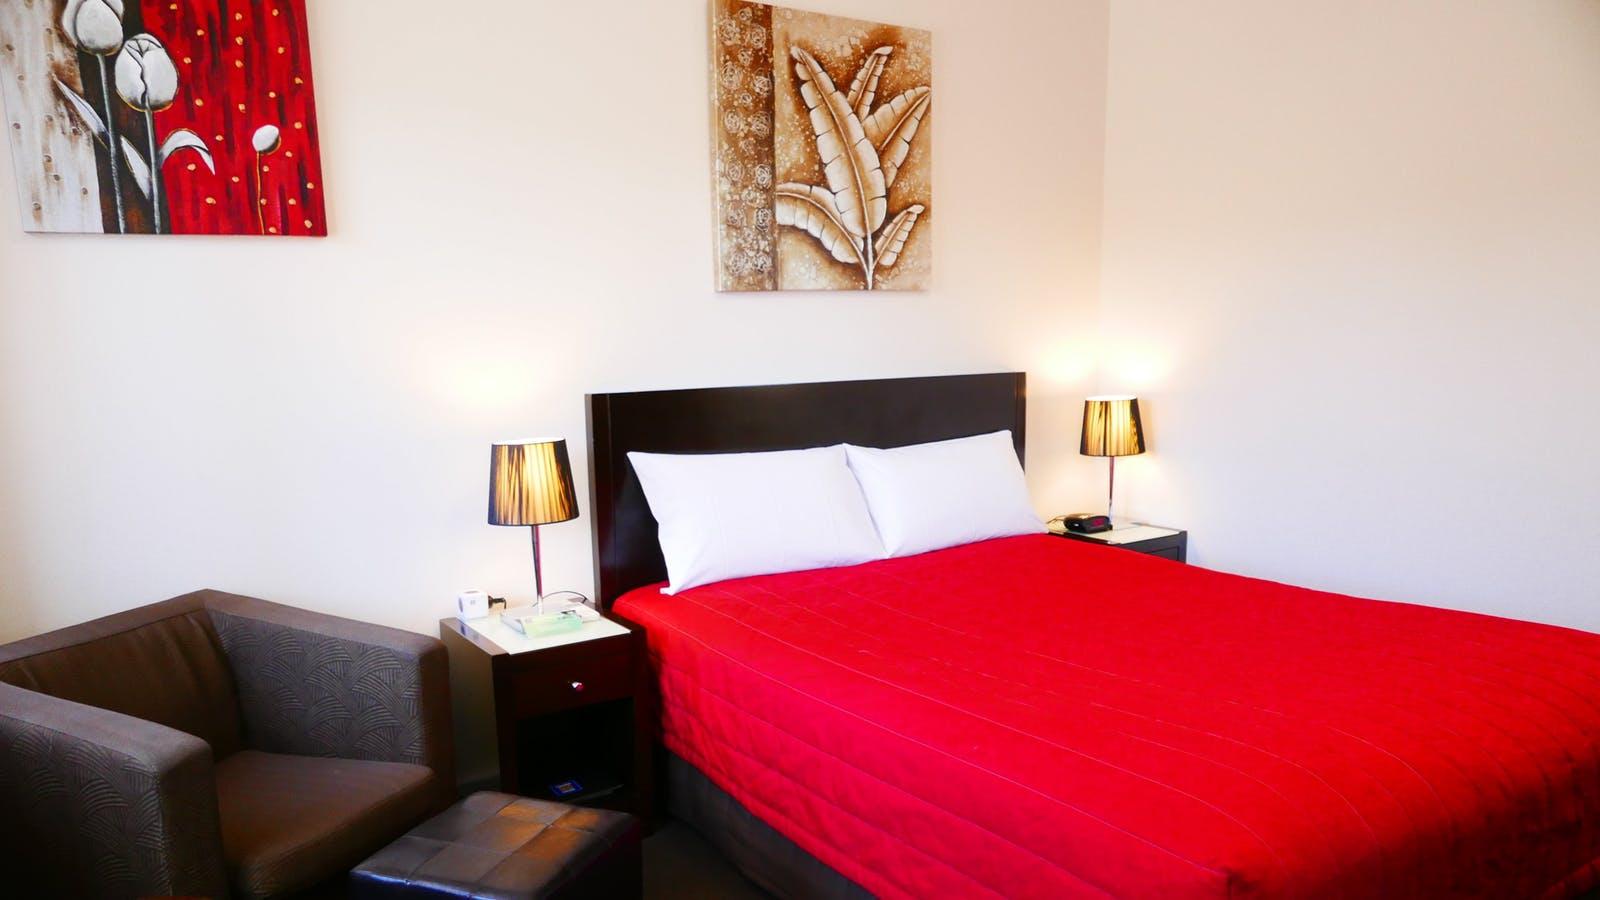 Room 15 - Economy Queen Room at Junction Motel, Maryborough